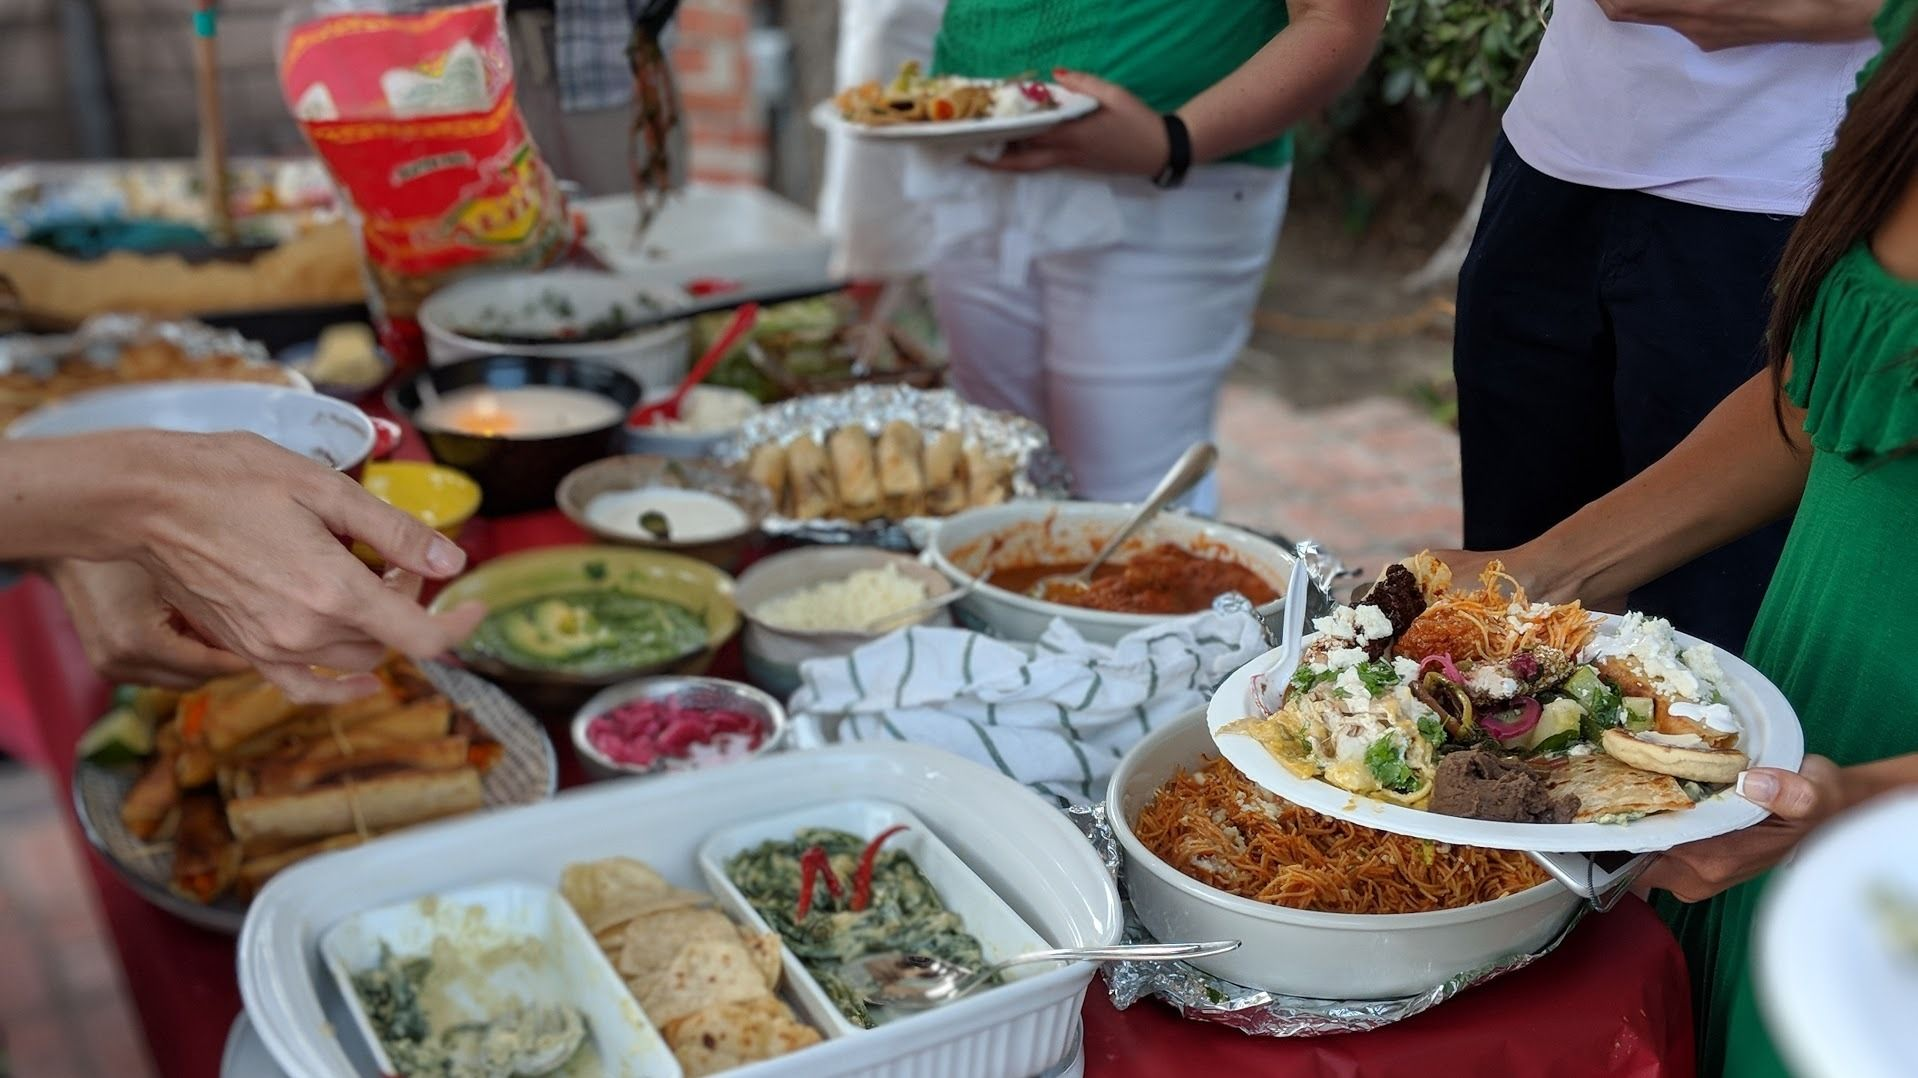 Los Angeles Cookbook Club